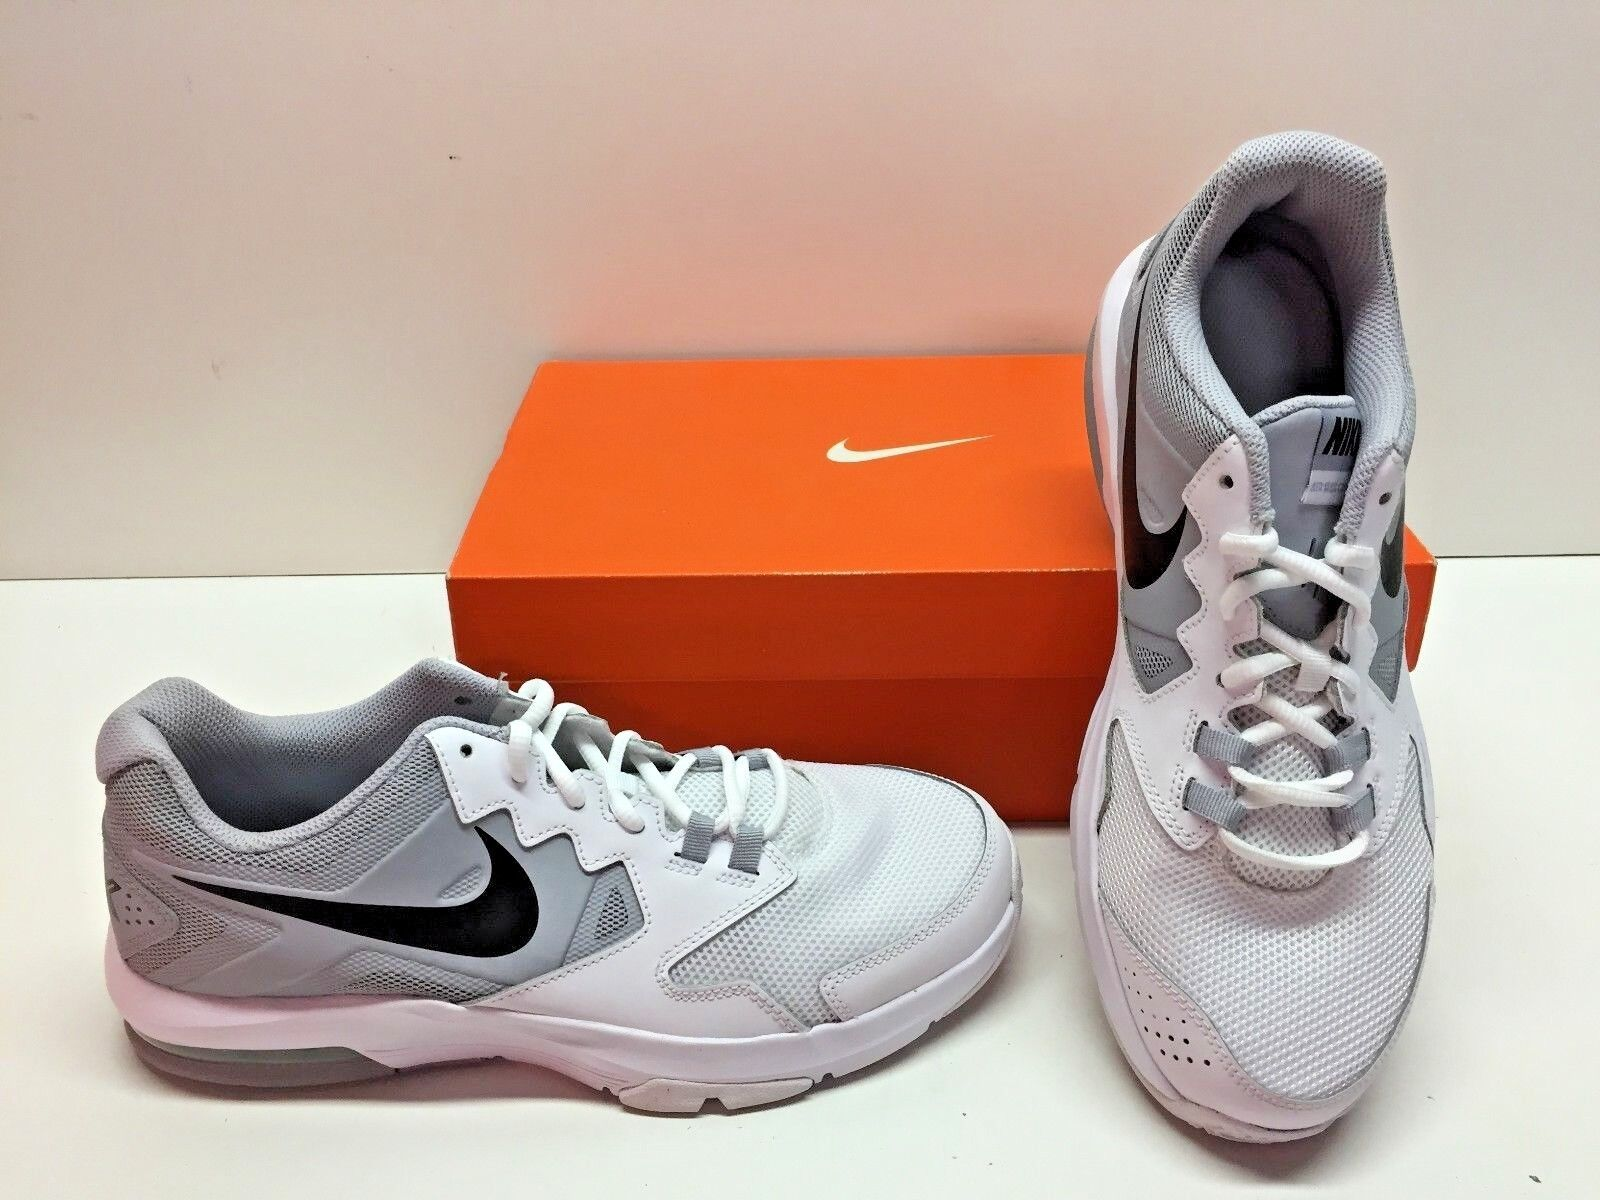 size 40 598d2 49e38 ... good nike air max crusher 2 running cross gris training zapatos hombre  zapatillas gris cross blanco